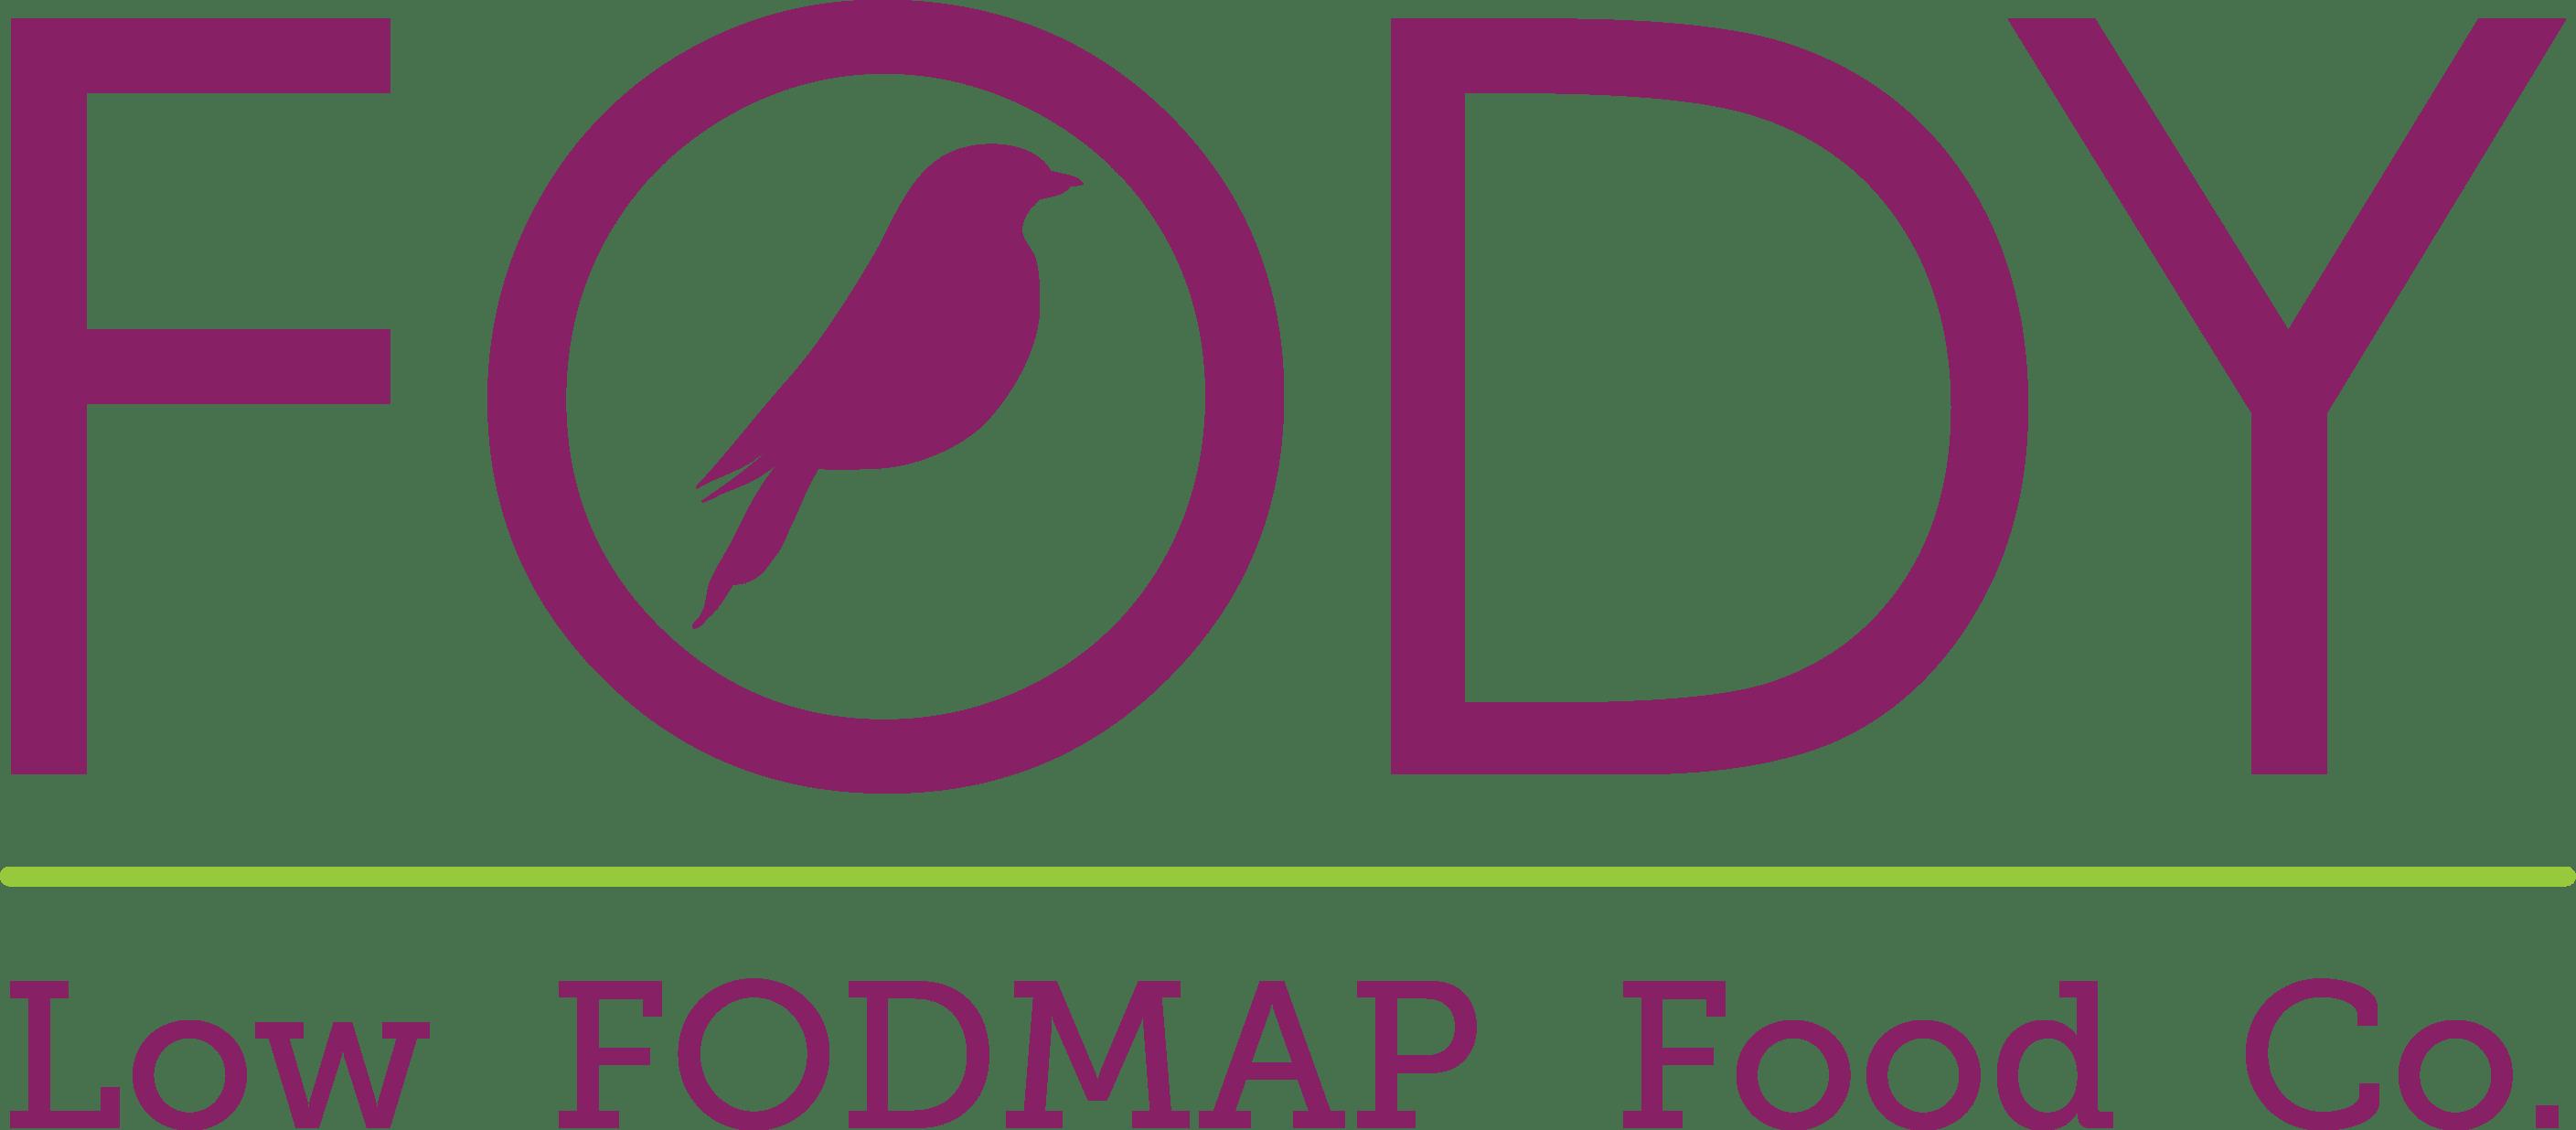 FODY Foods Low FODMAP Food Co Logo